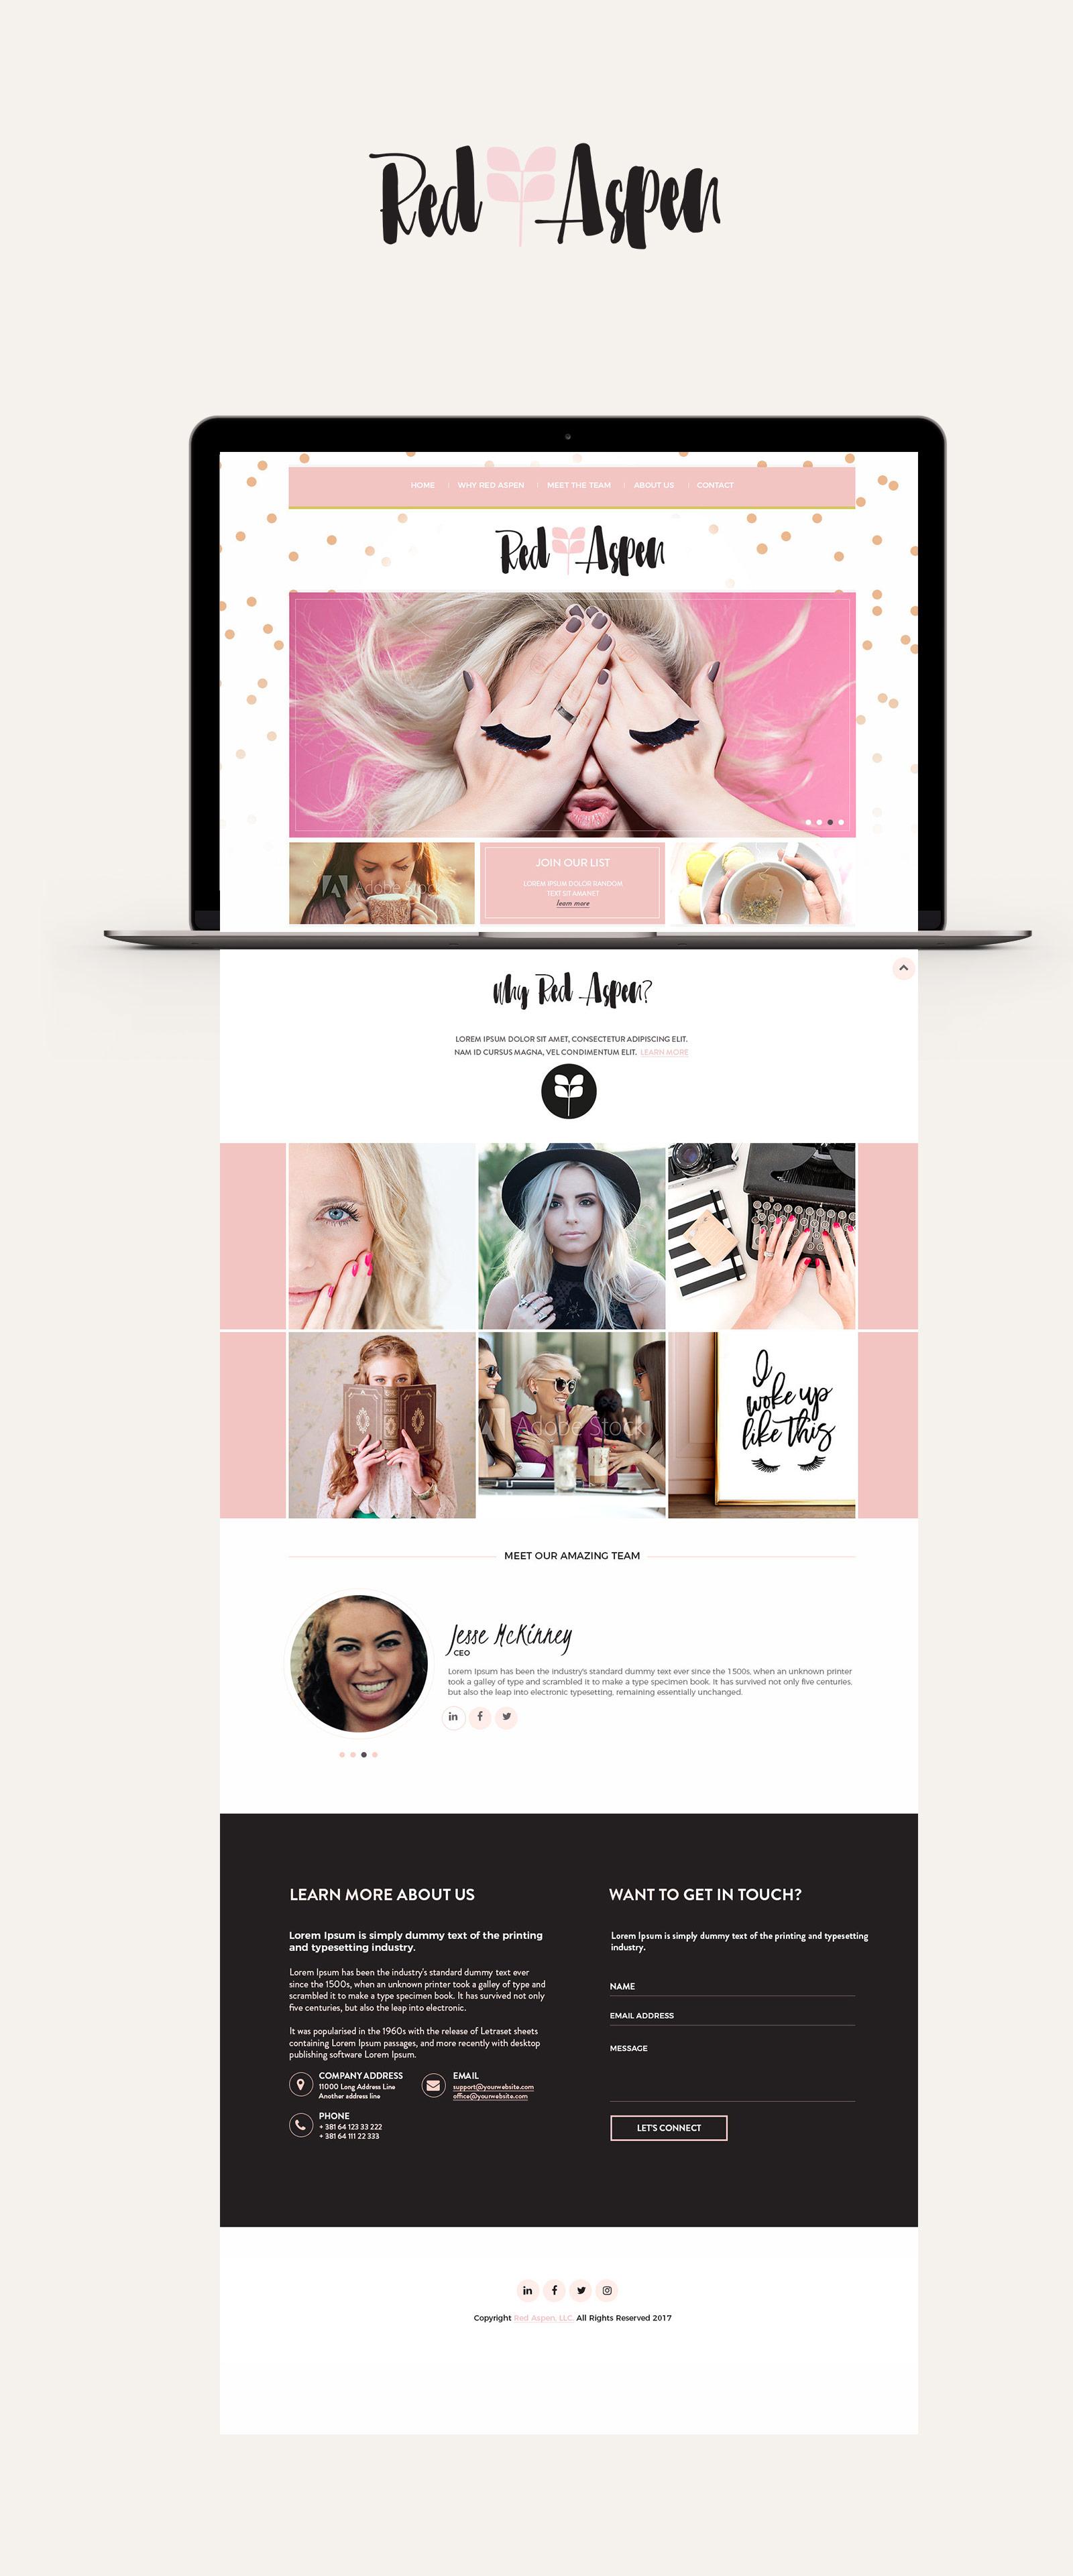 portfolio-Red-Aspen-web-scroll.jpg